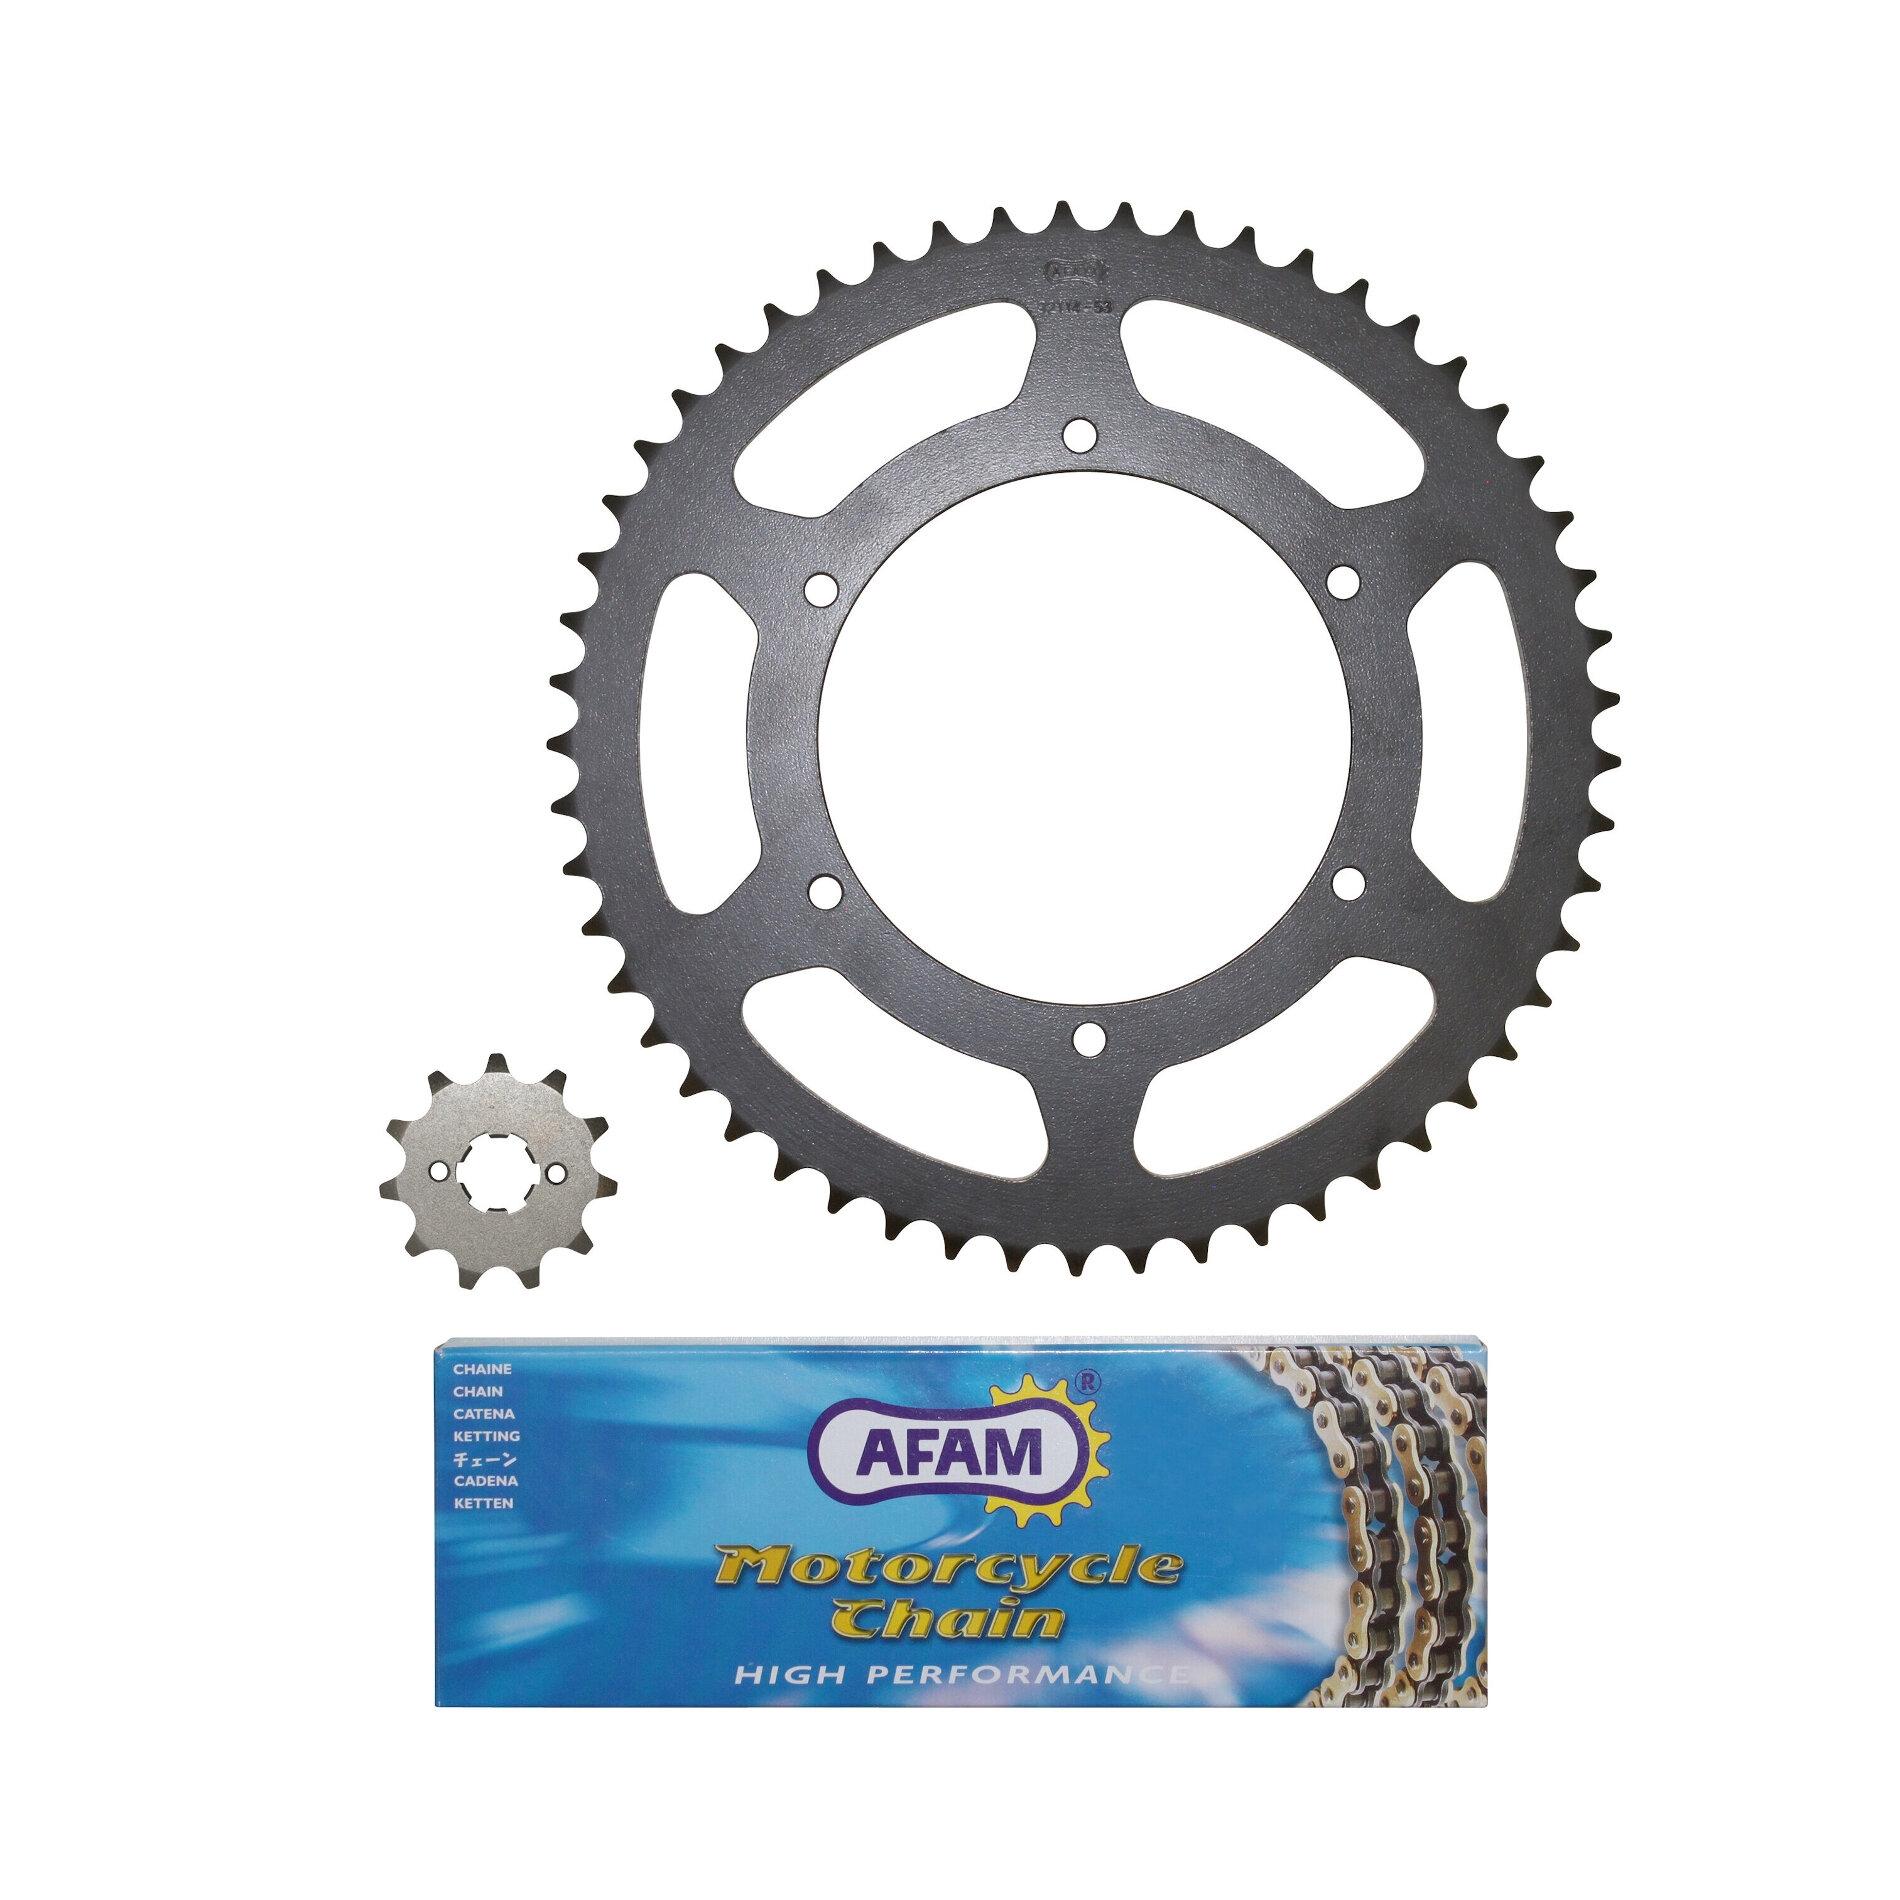 Kit chaîne Afam pas 420 11X53 Derbi Senda Sm Drd / Racing / Evo / Gpr